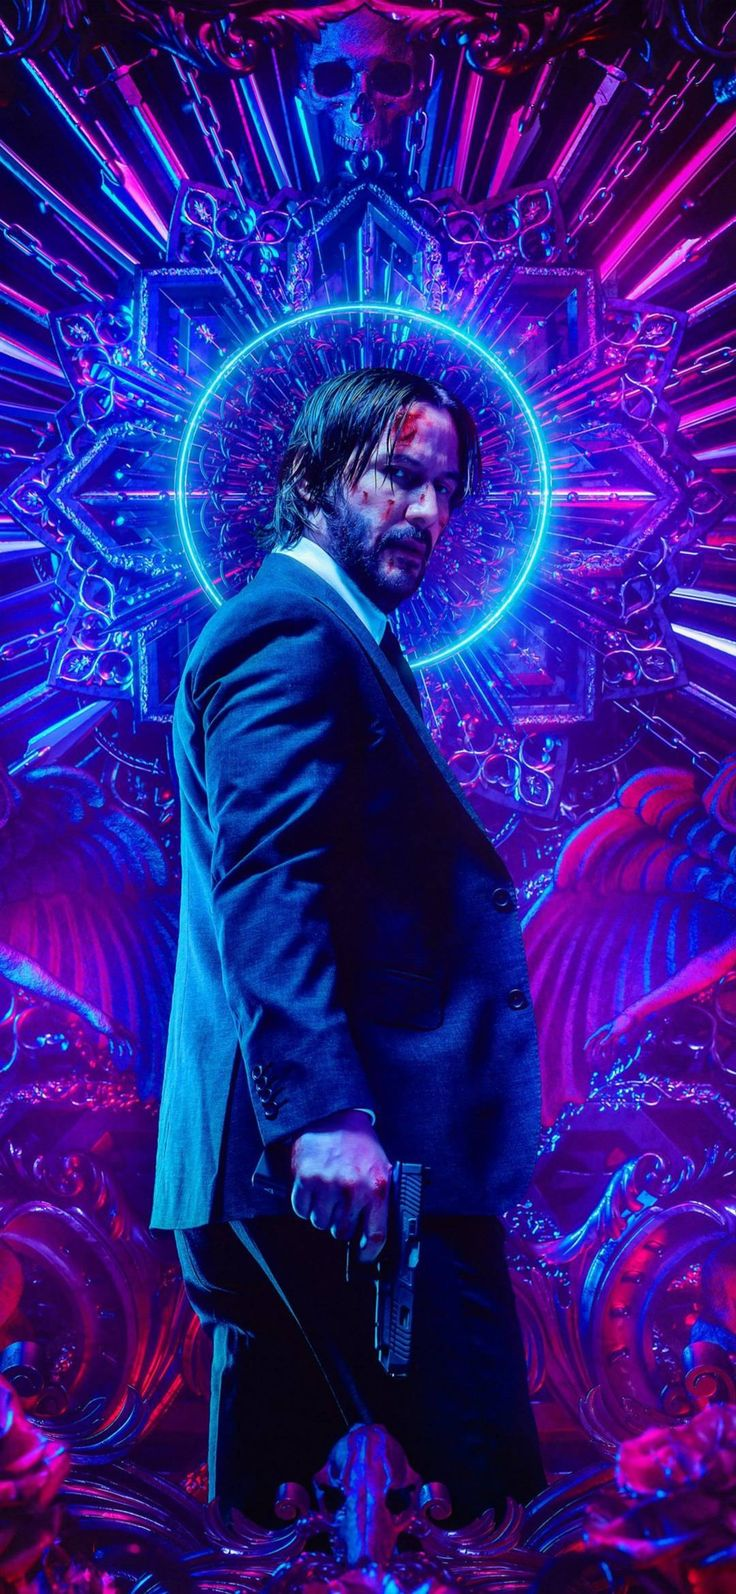 john wick HD wallpaper | Movie art, John wick hd, Keanu ...